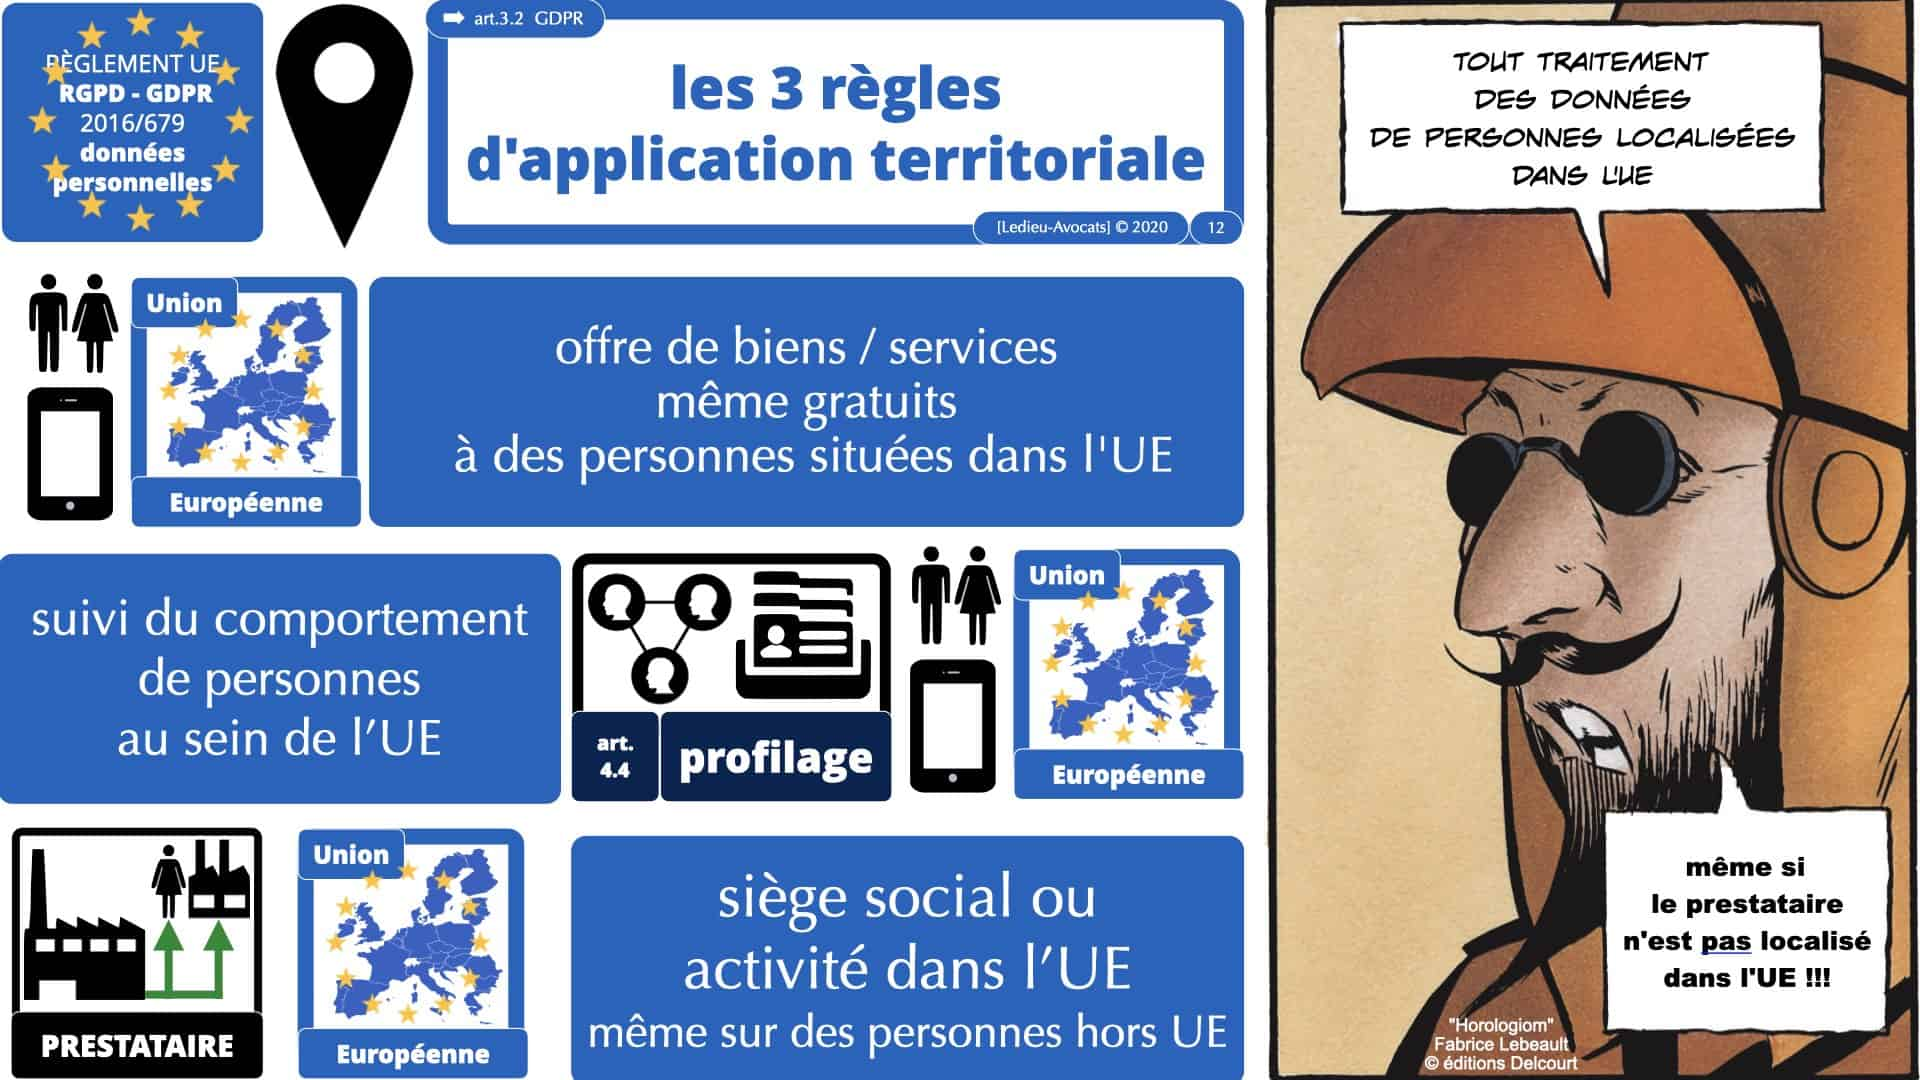 312 AWS PODCAST RGPD [20-11-2020] *16:9* © Ledieu-Avocats 20-11-2020.012